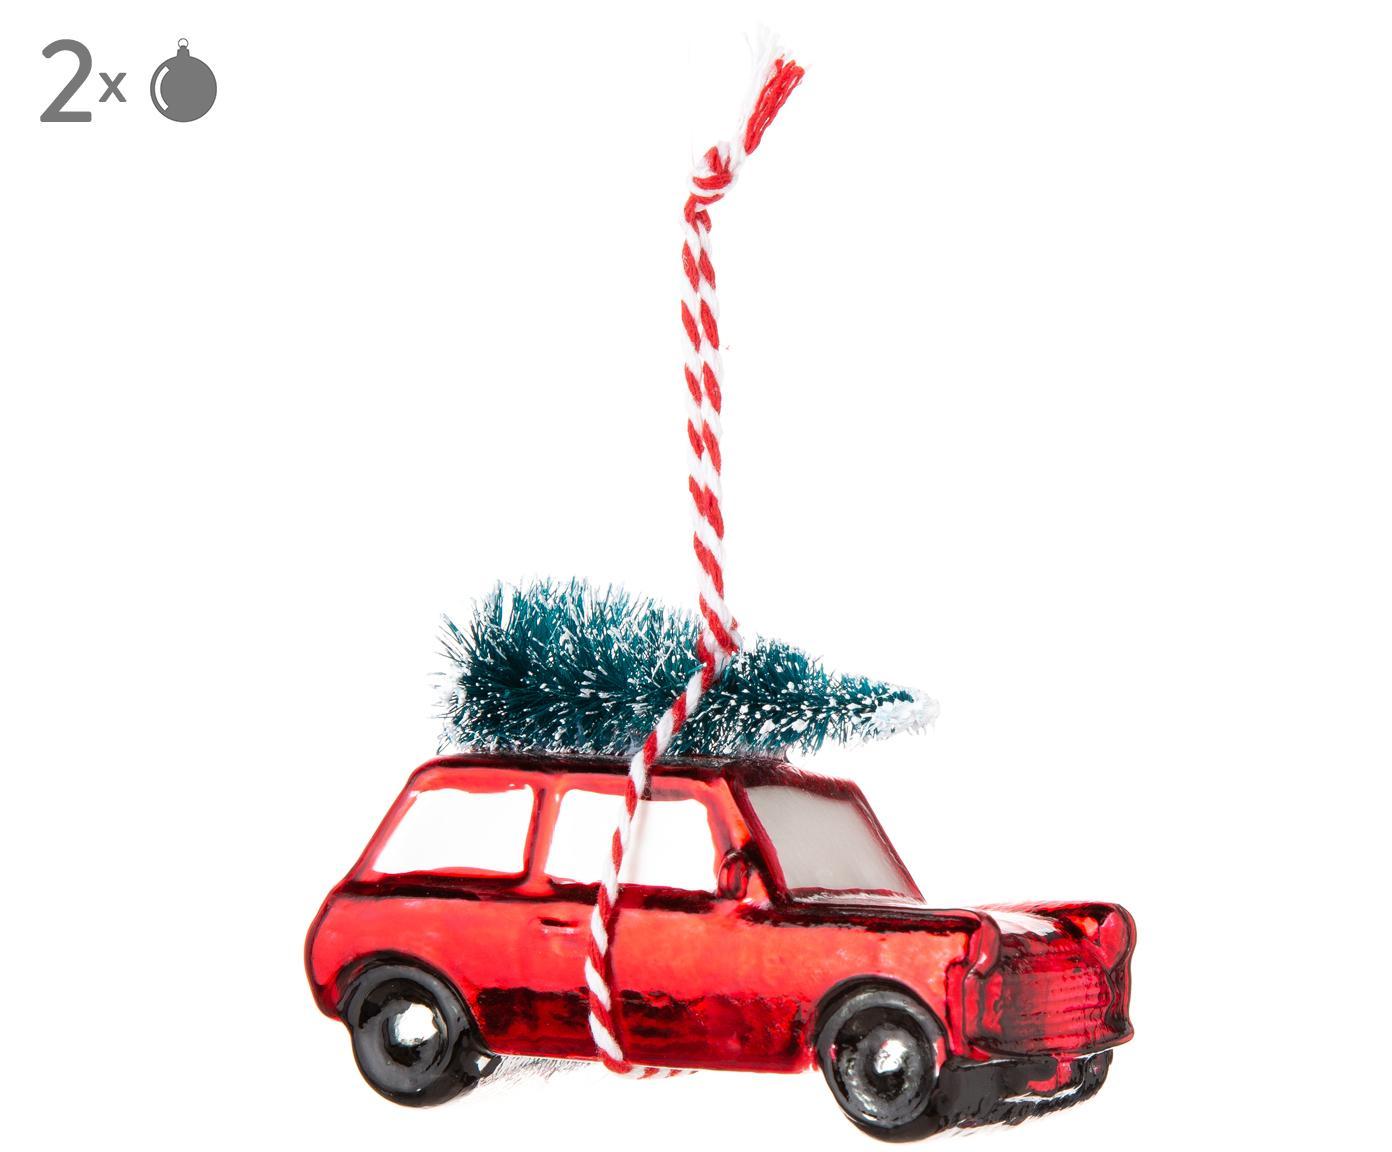 Ciondolo Car, 2 pz., Cinturino: lana, Natale rosso, verde, bianco, L 7 x A 4 cm